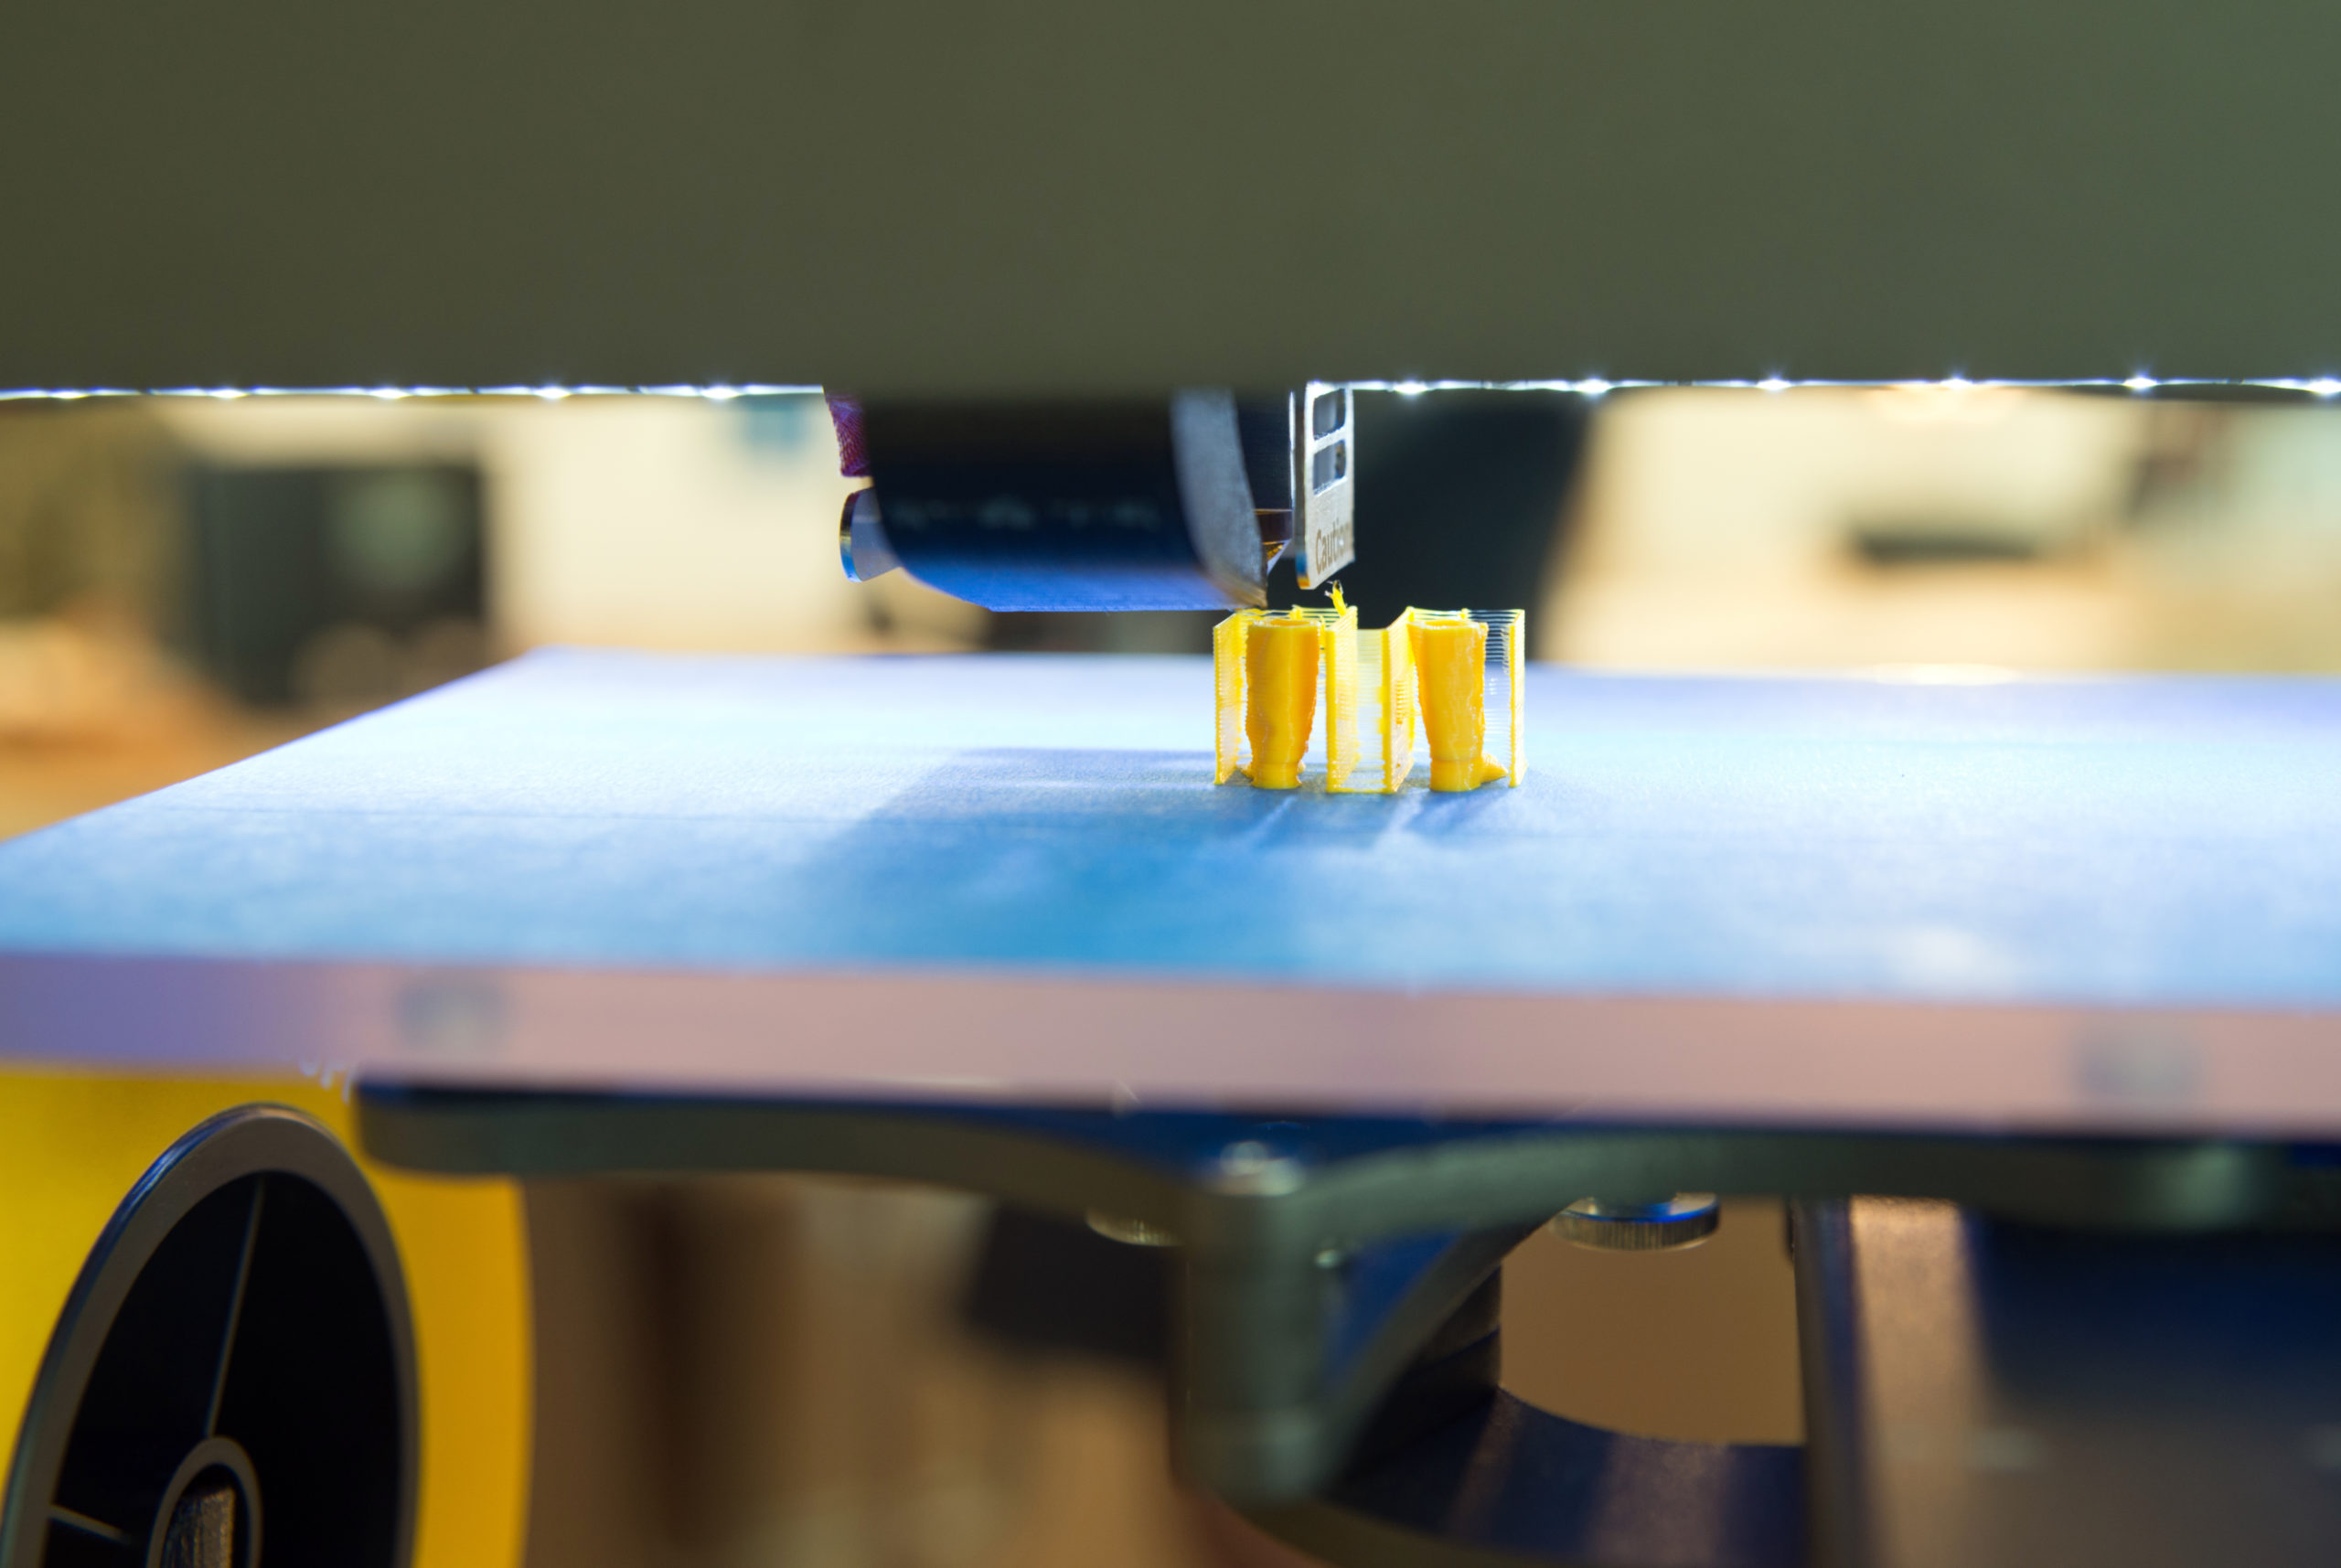 3D Printer (FDM)